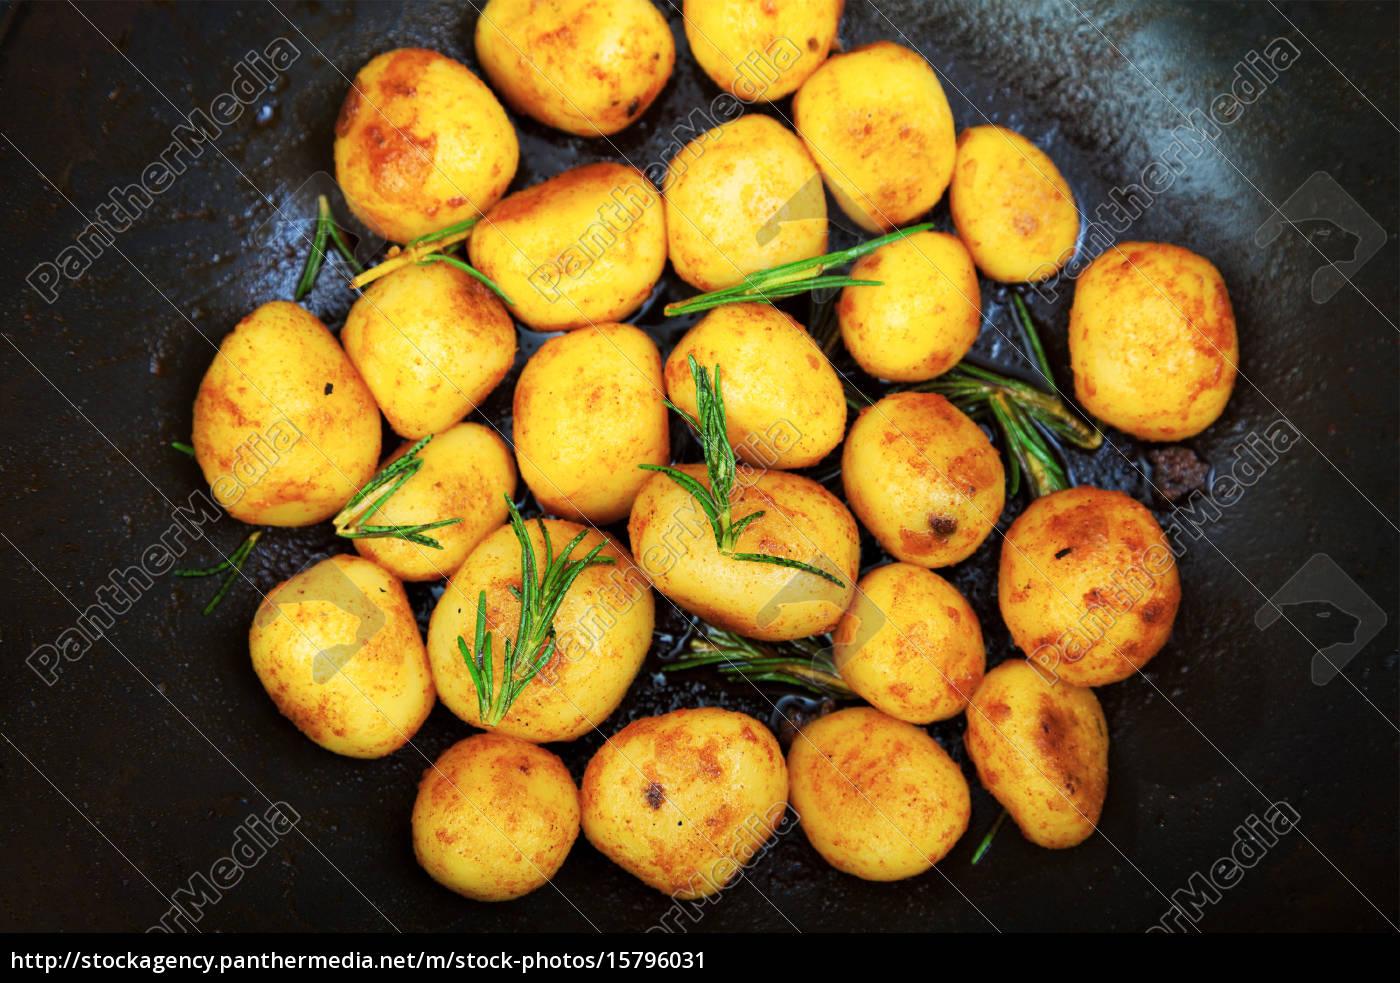 fried, baby, potatoes, fried, baby, potatoes, fried, baby - 15796031